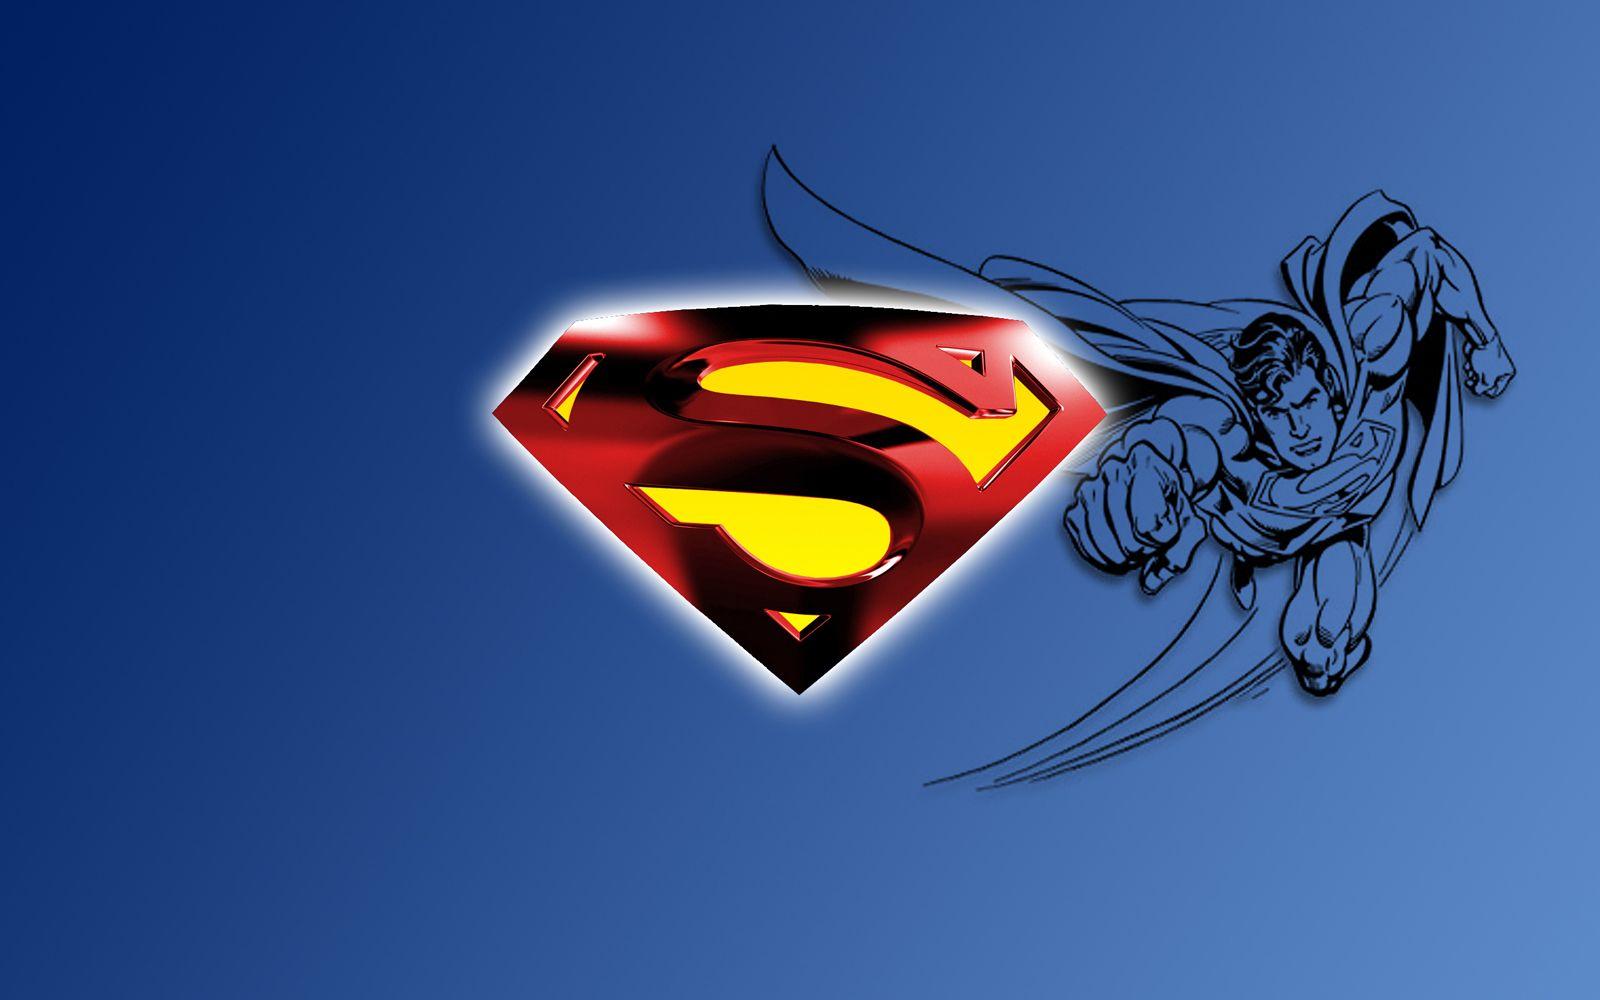 Superman Background Wallpaper Superman wallpaper